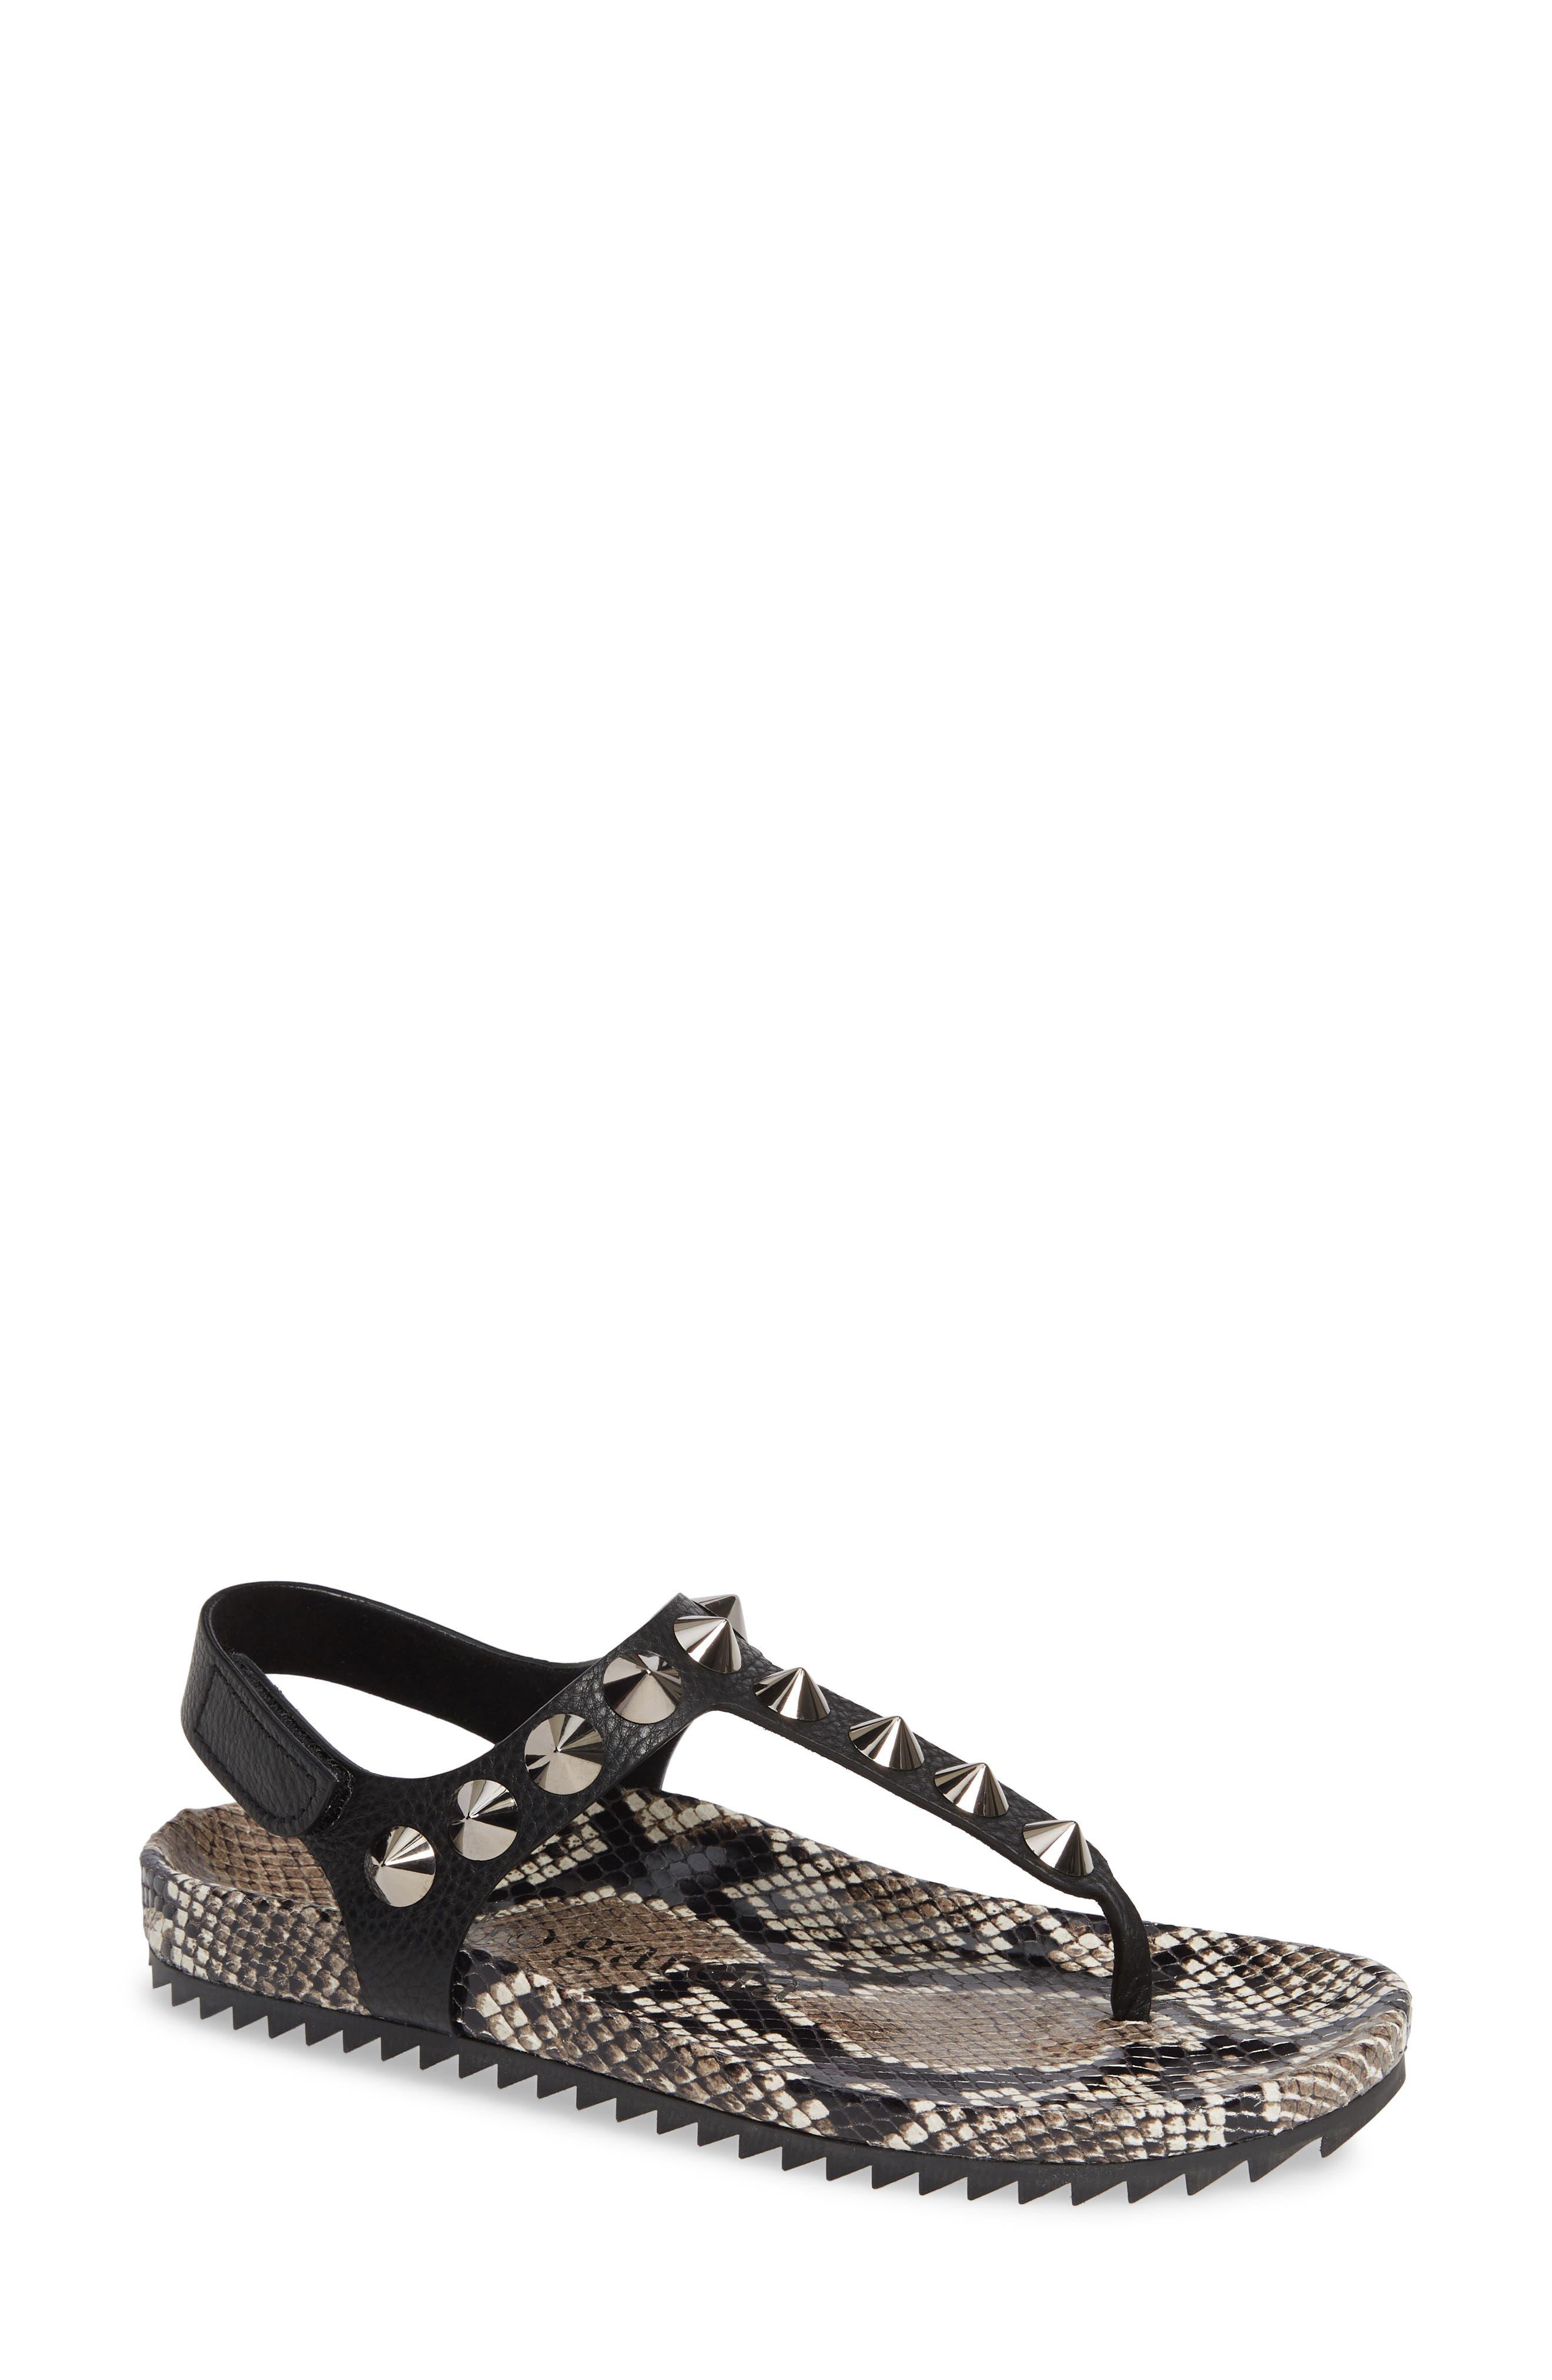 Athena Studded Thong Sandals in Black Snakeskin